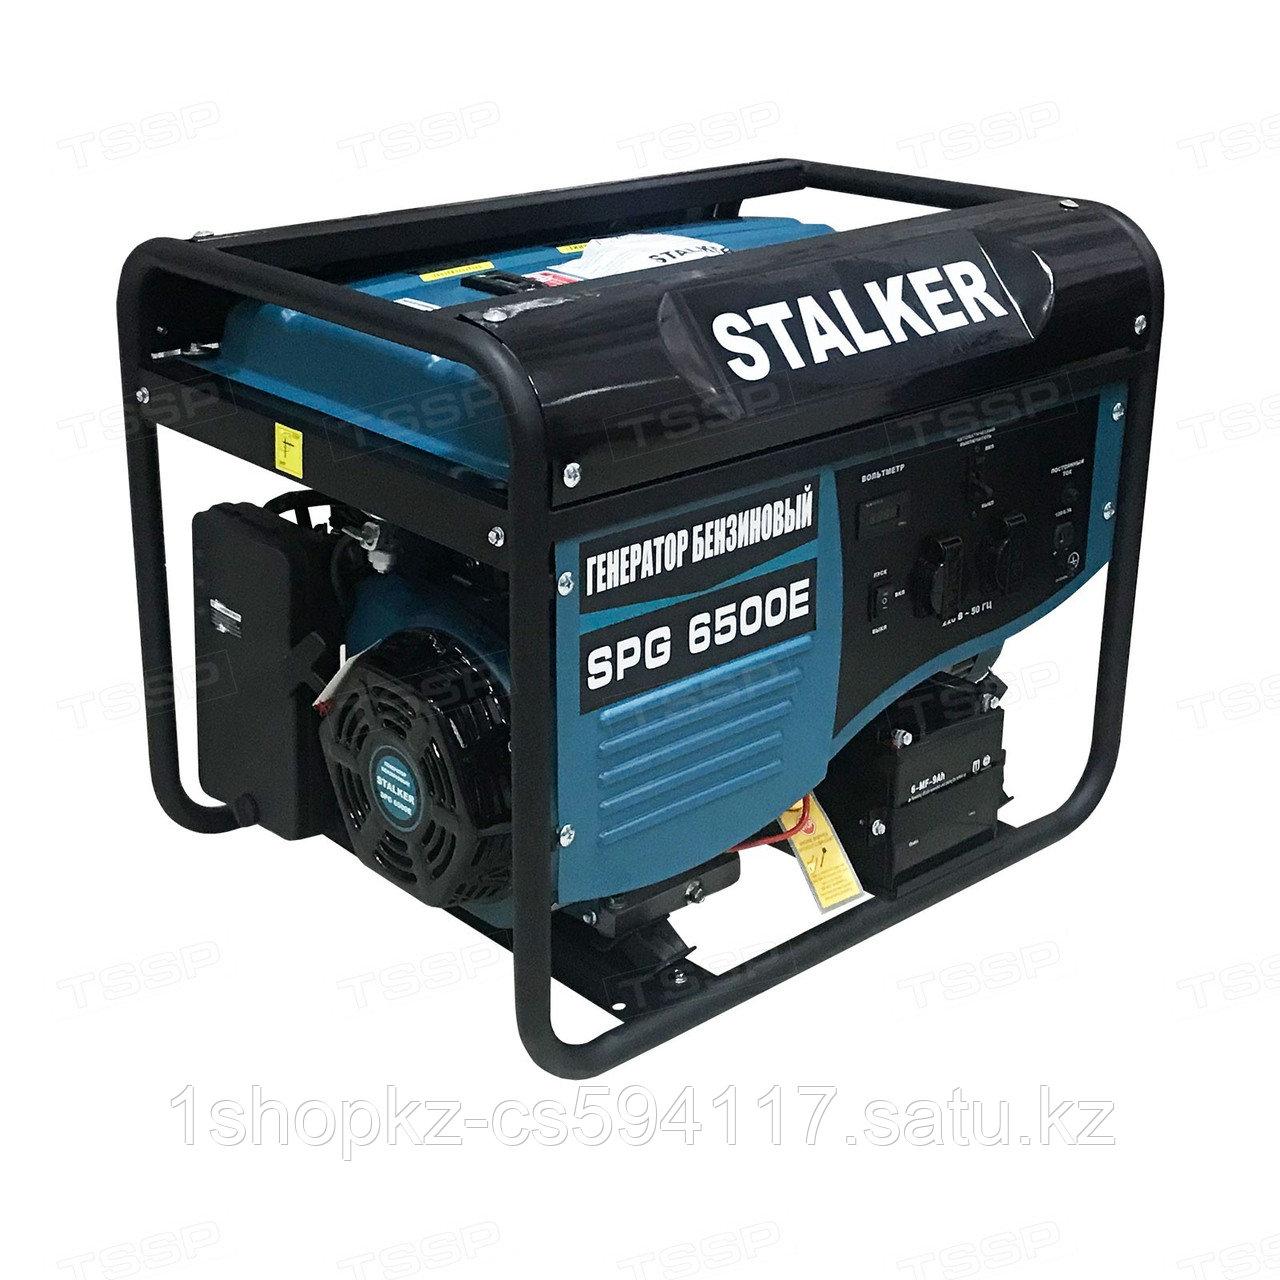 Бензиновый генератор SPG 6500E Stalker